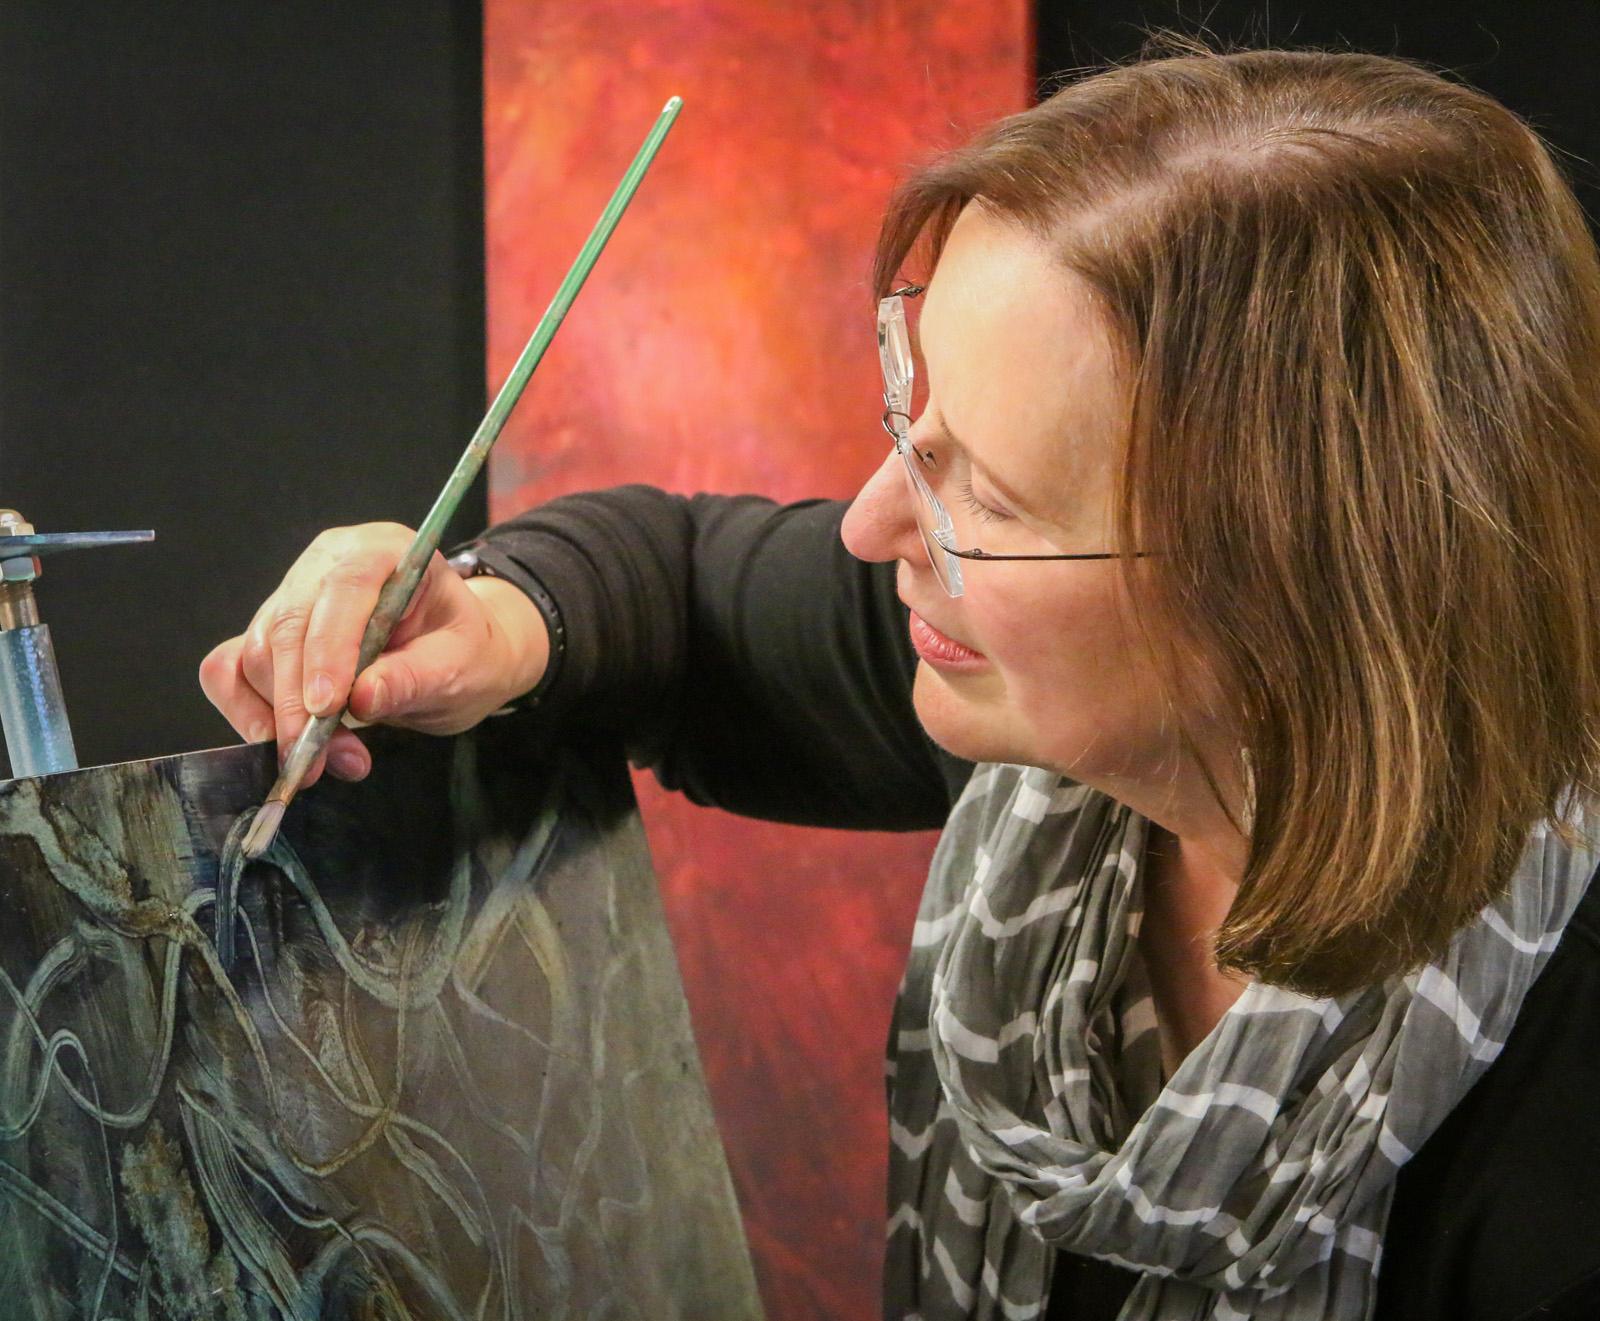 heather stivison painting in studio